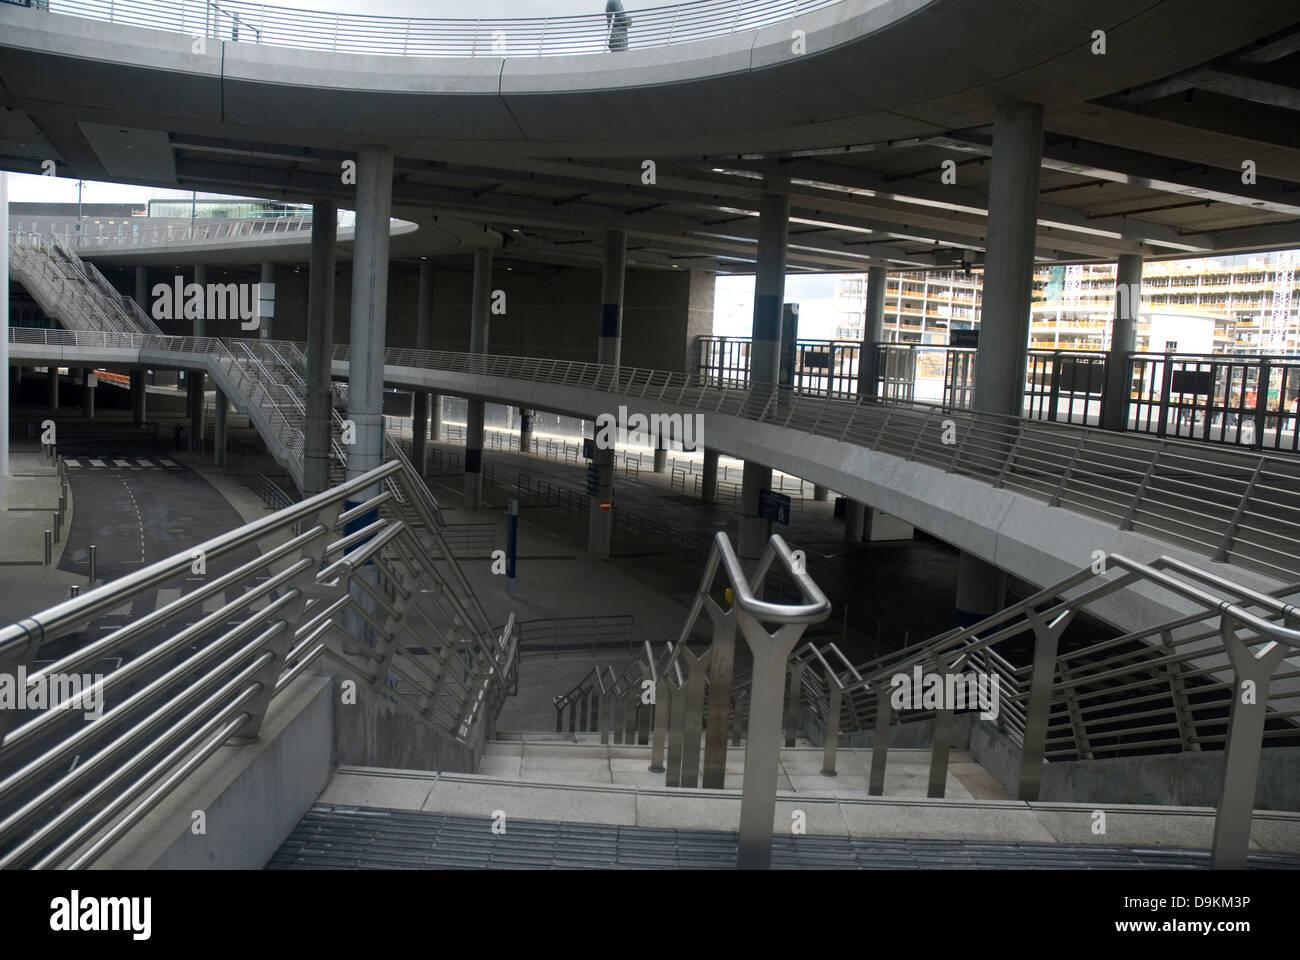 concrete stairs at stadium Stock Photo